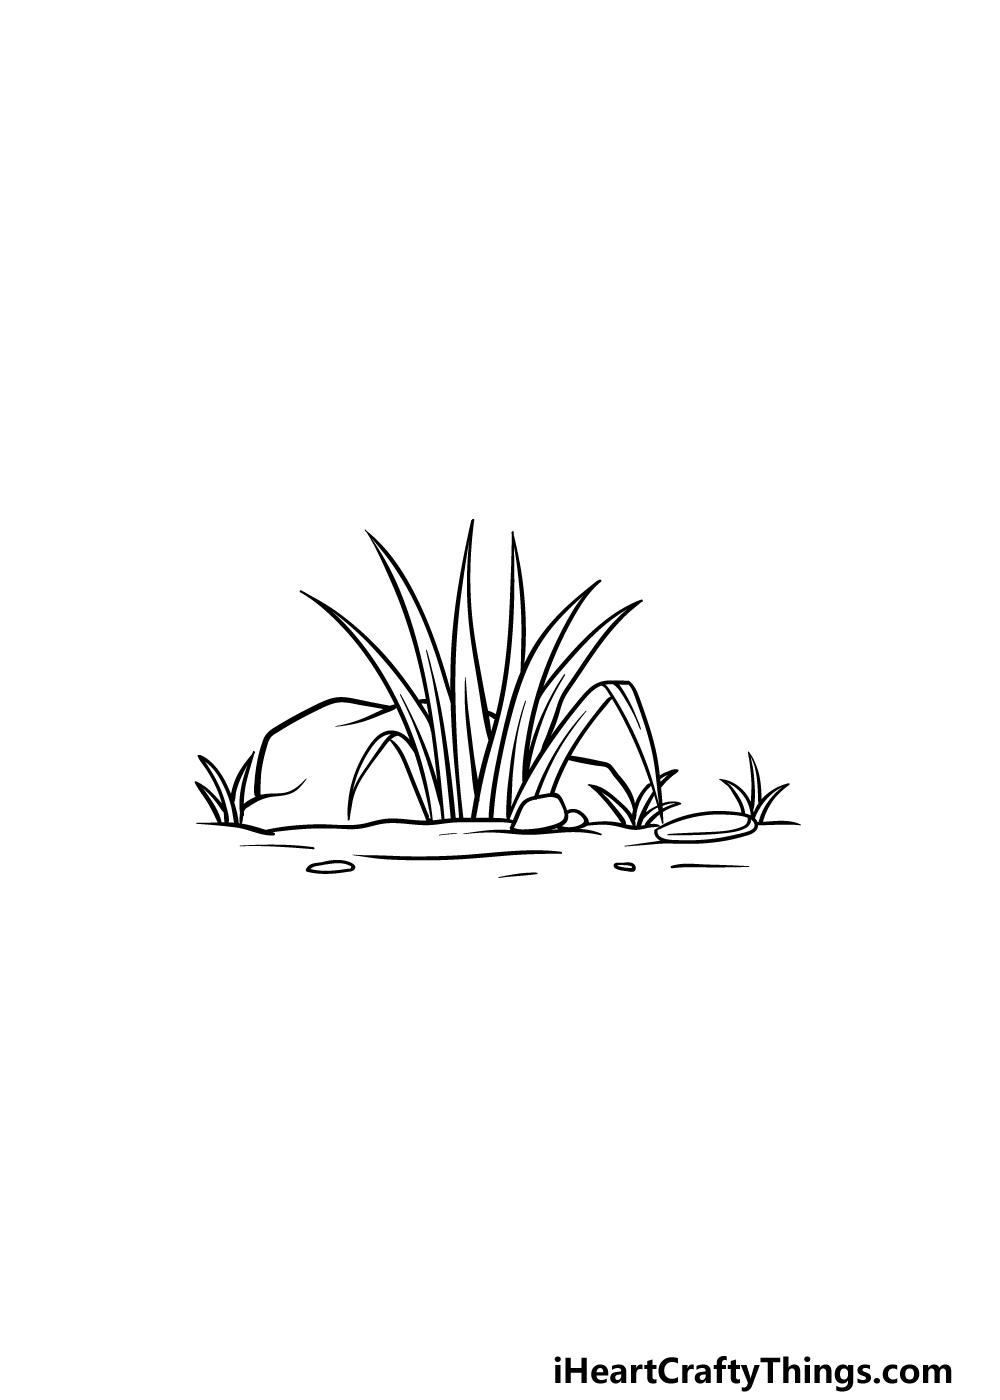 drawing grass step 5